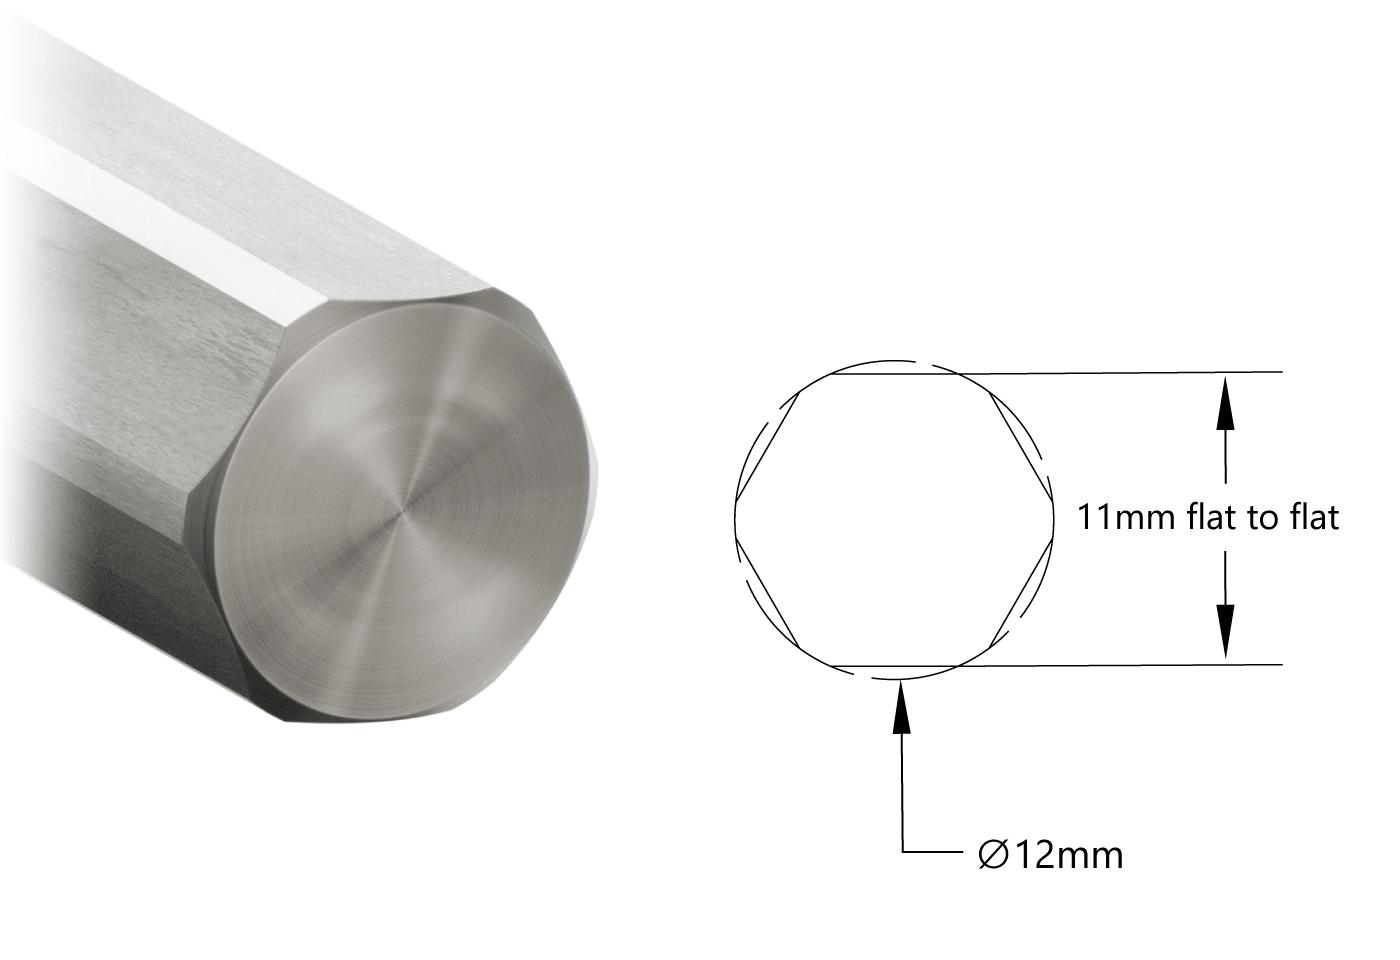 2102 Series 12mm REX Shafting